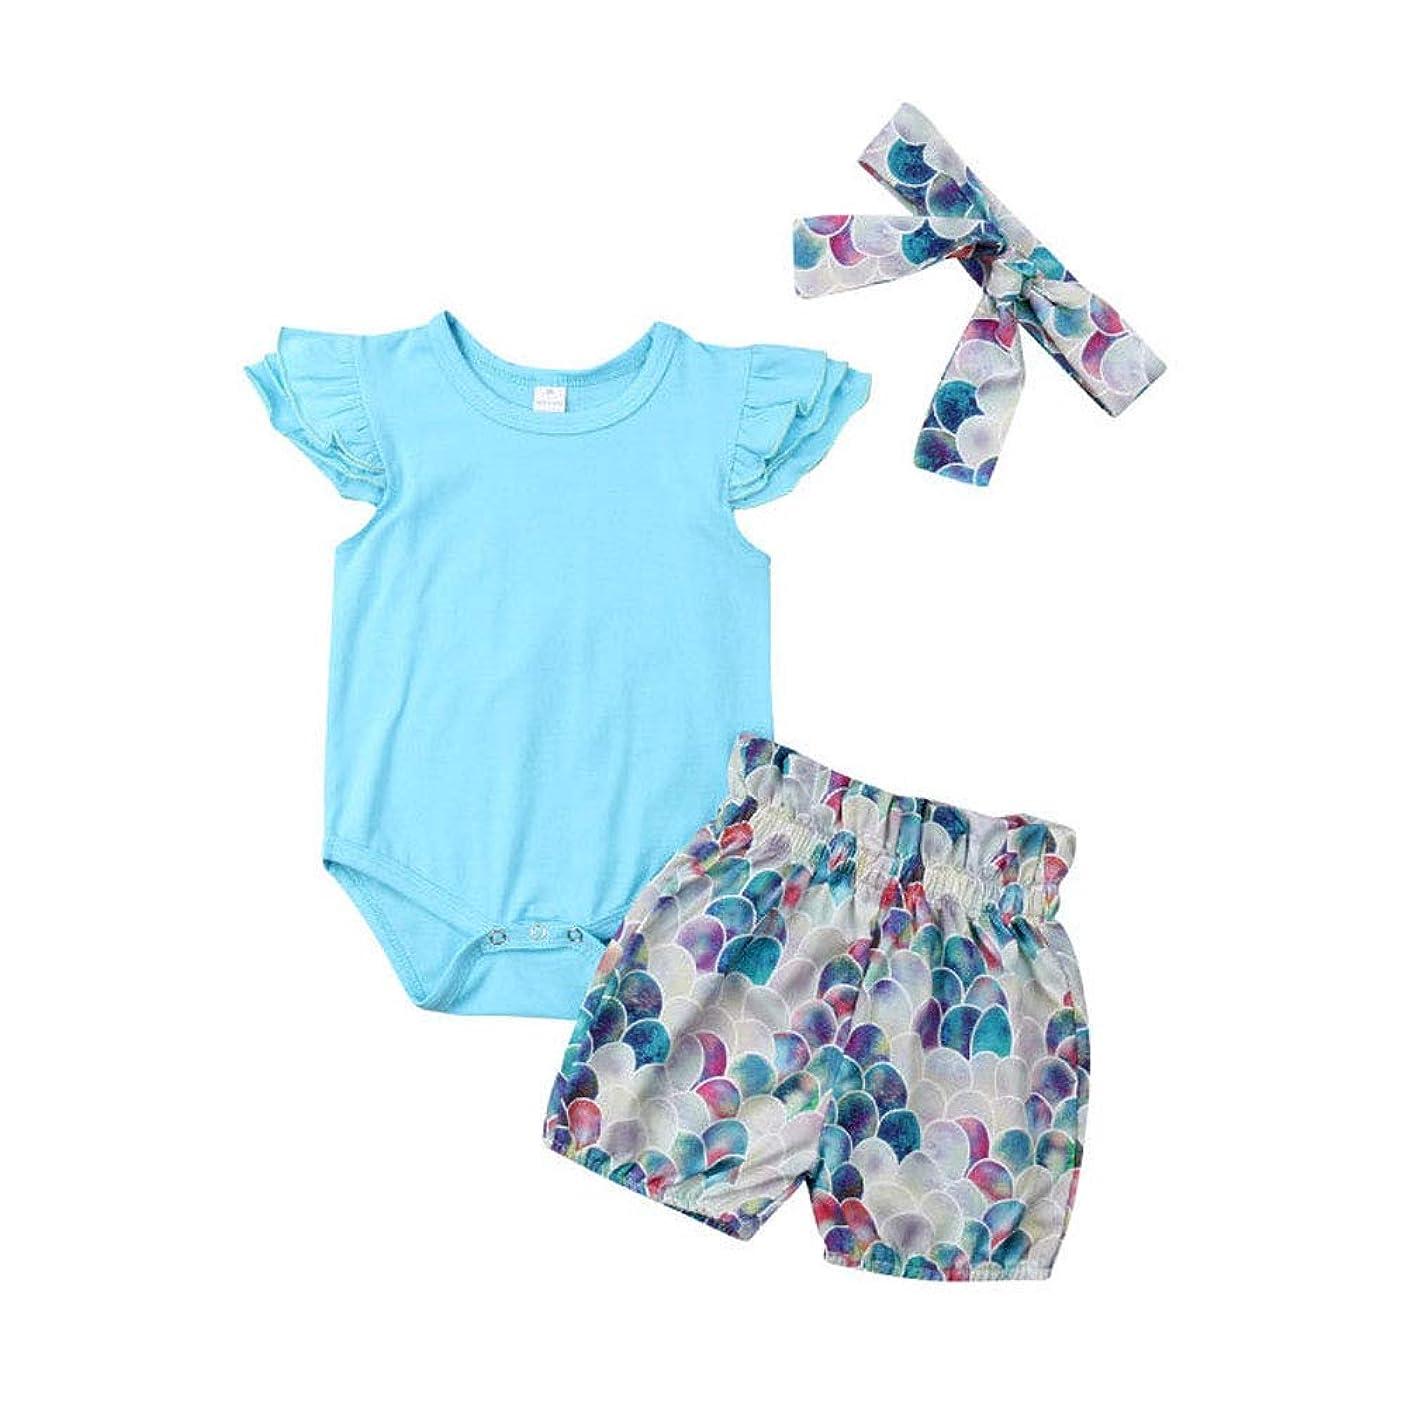 Newborn Baby Girl Ruffles Romper Bodysuit + Mermaid Shorts + Headband 3Pcs Outfit Set